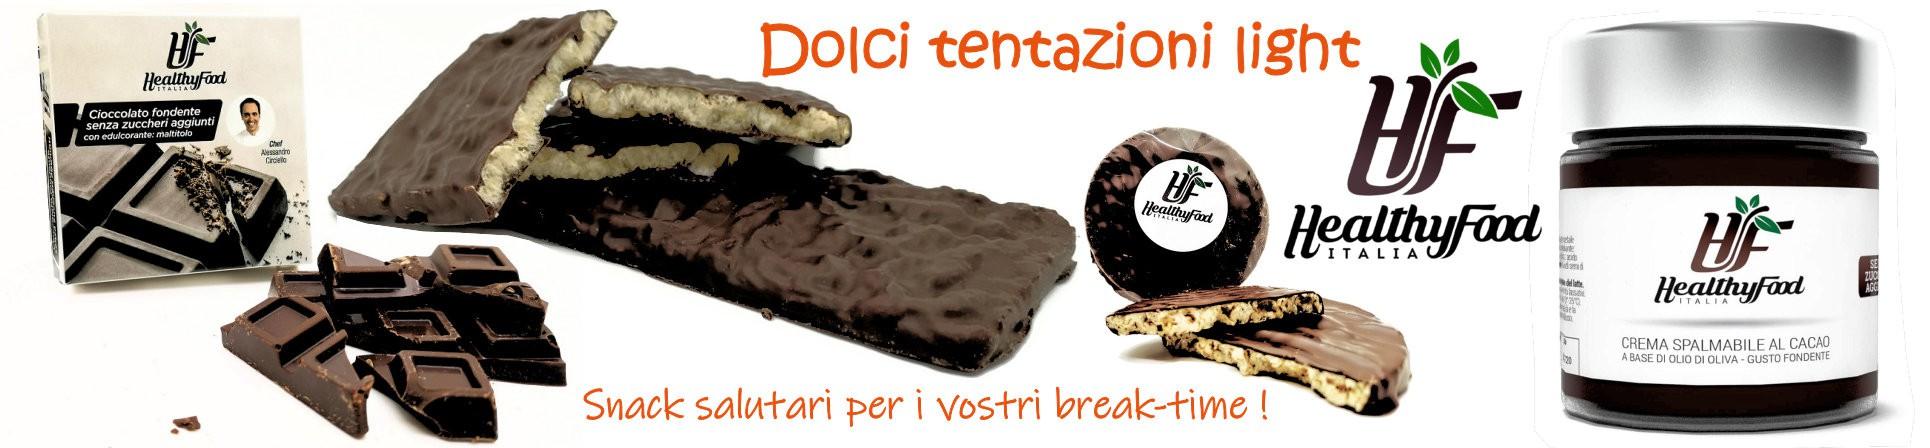 snack salutari vendita online snack light - HEALTHY FOOD ITALIA